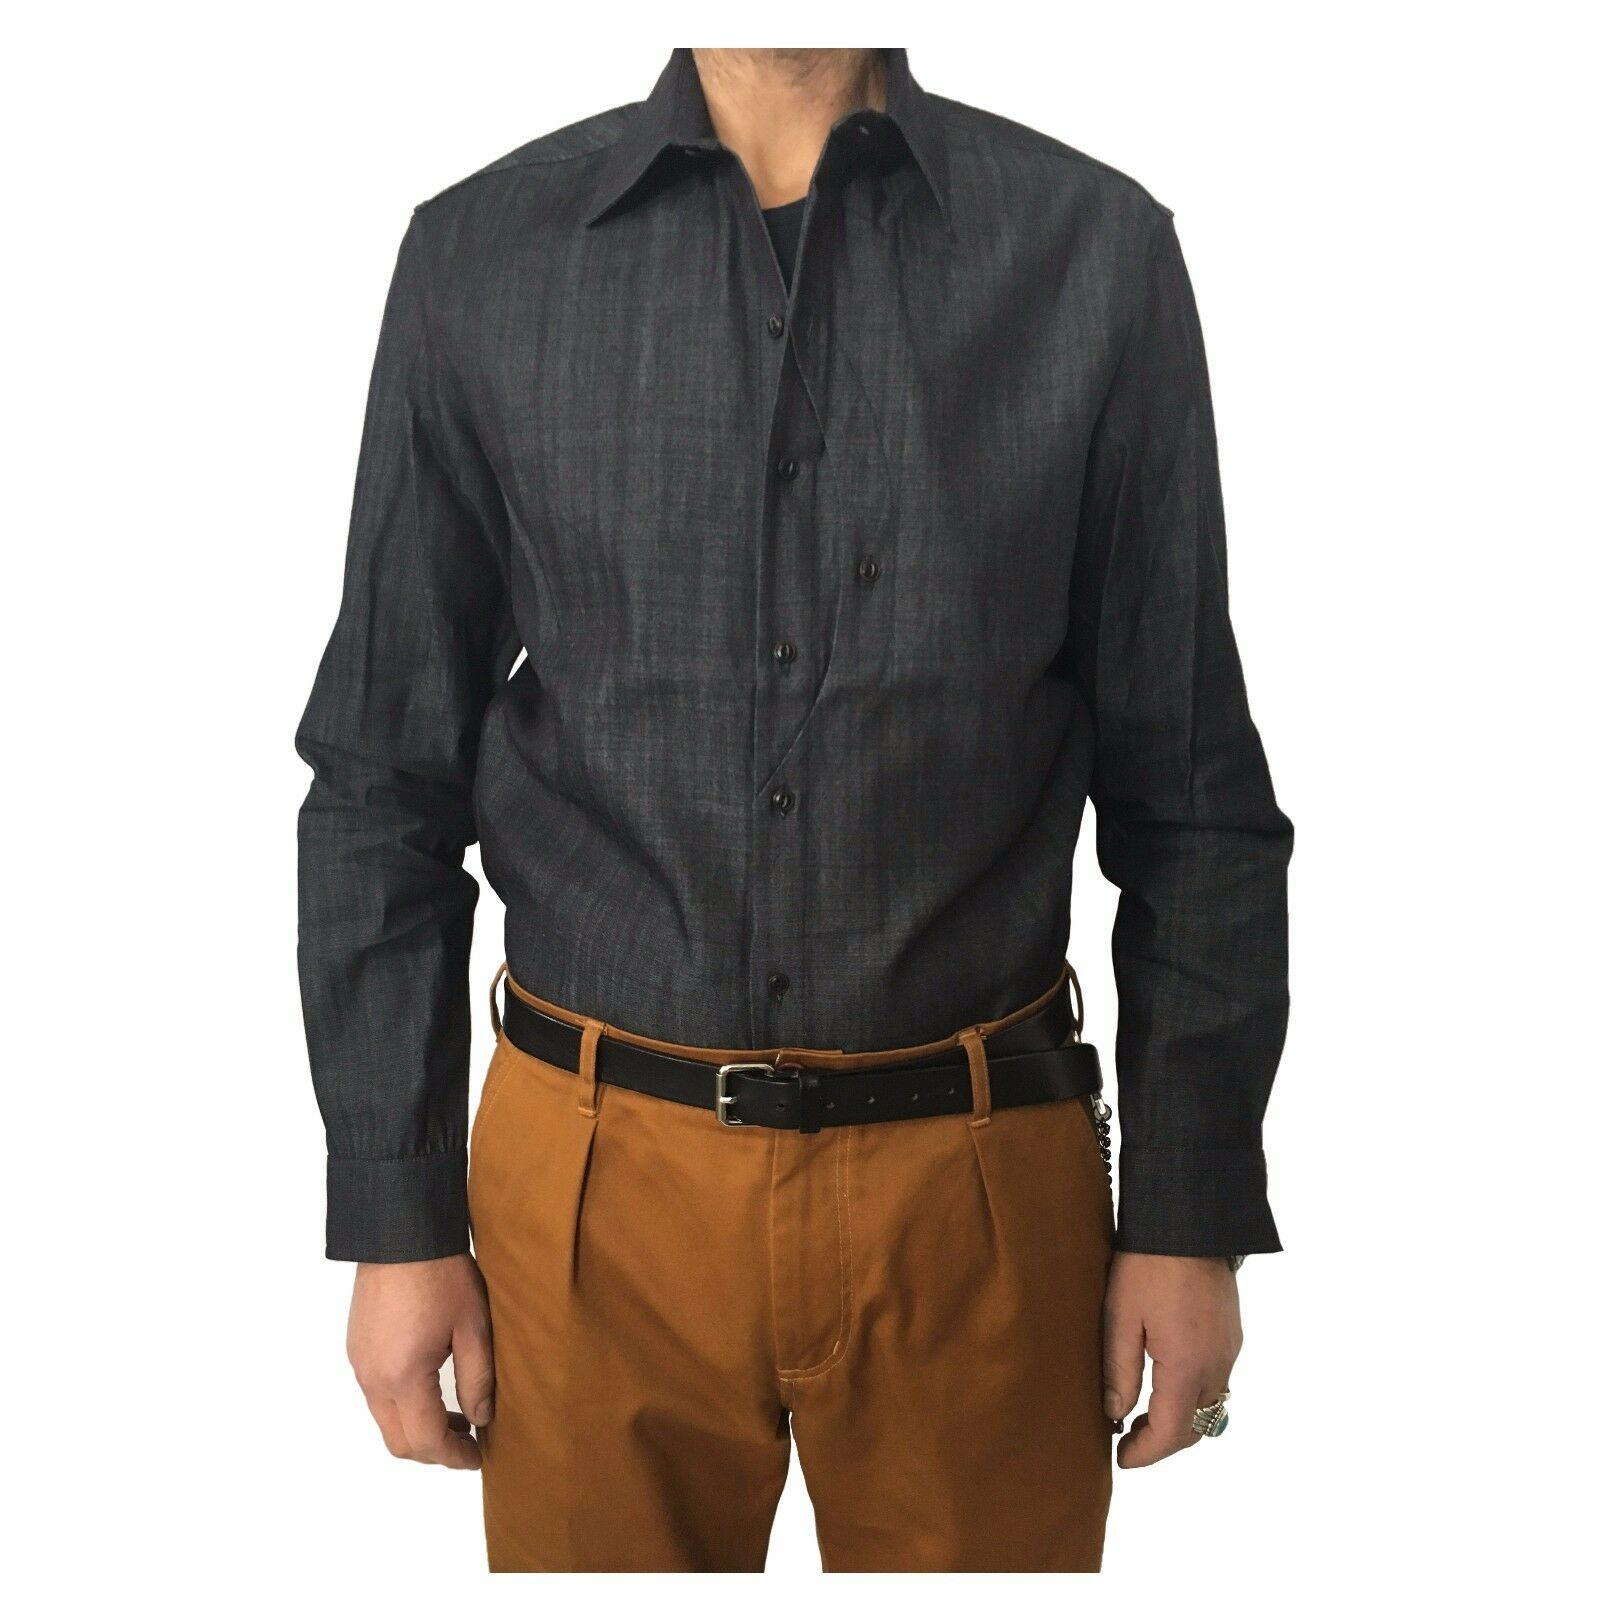 INDIGO AND GOODS men's shirts denim bluee mod GULLIVER SHIRT 100% cotton